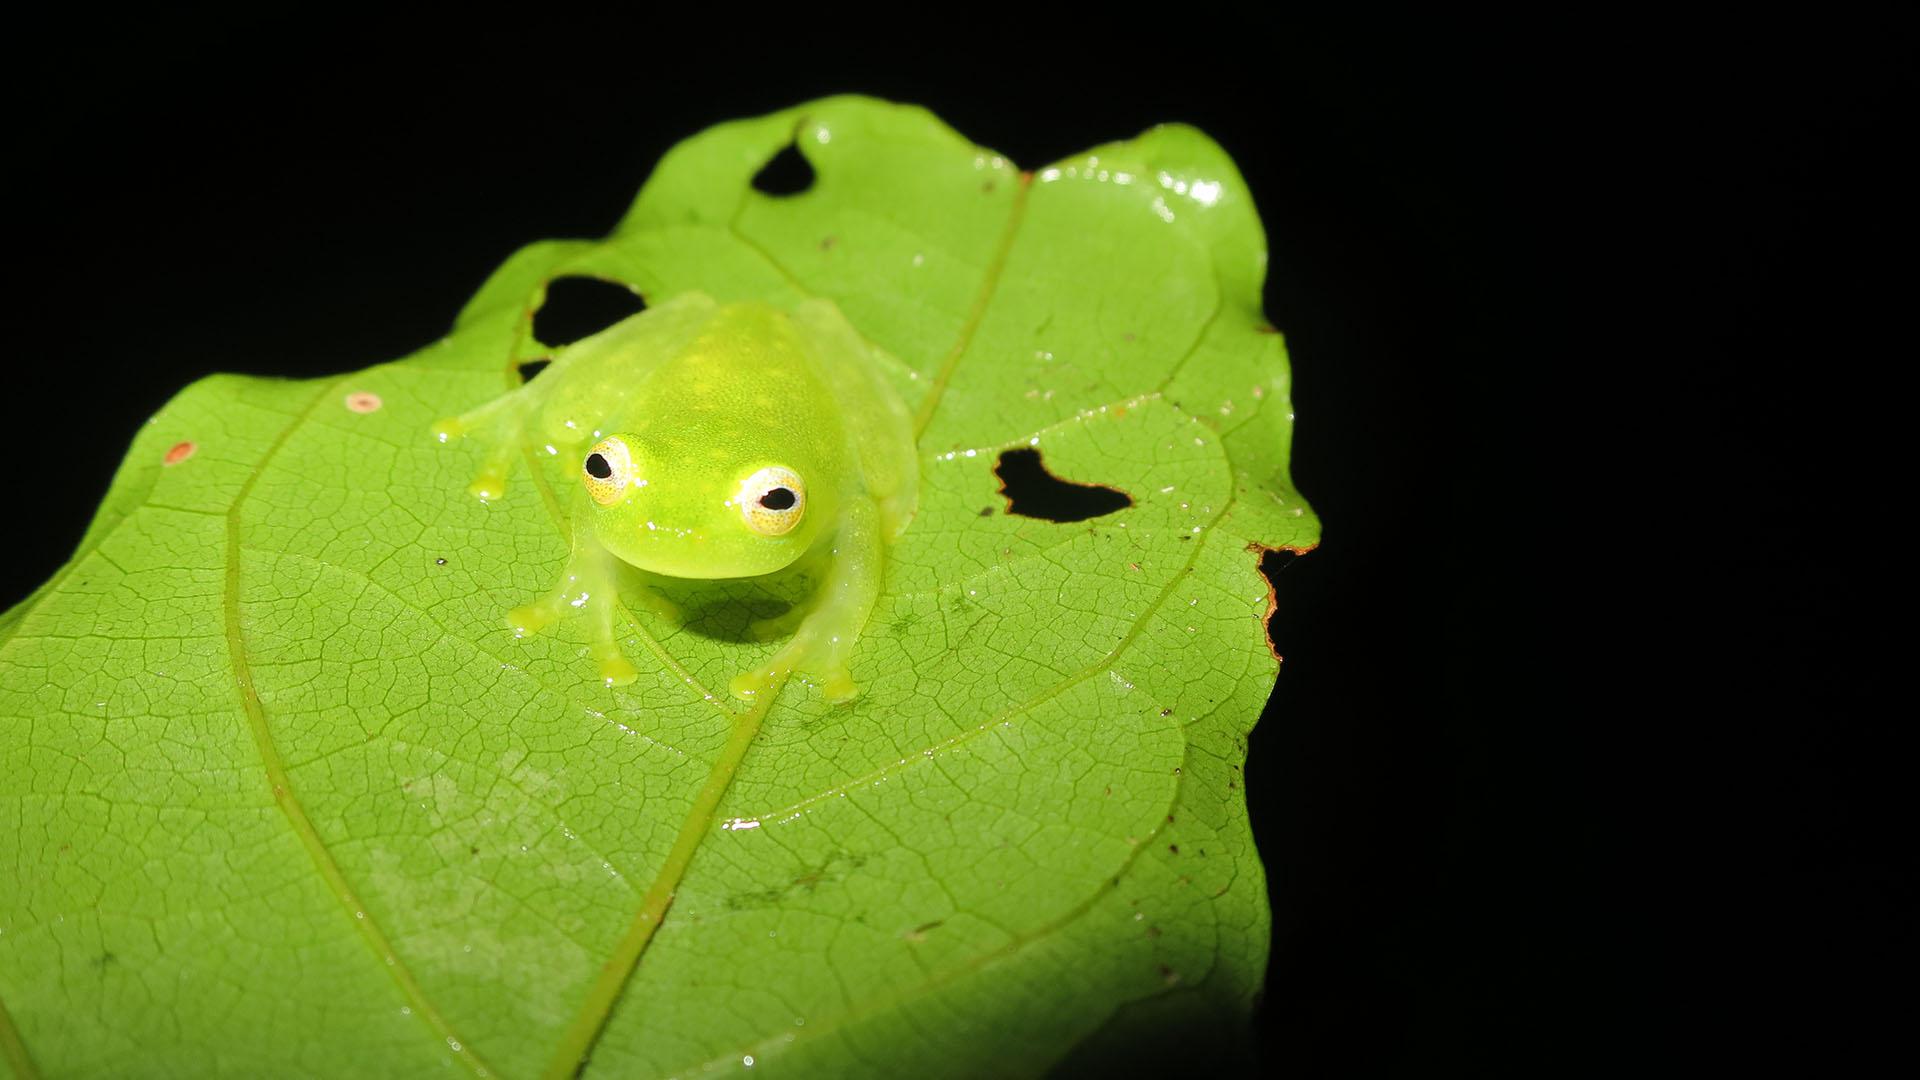 Costa Rica Amphibian Diversity